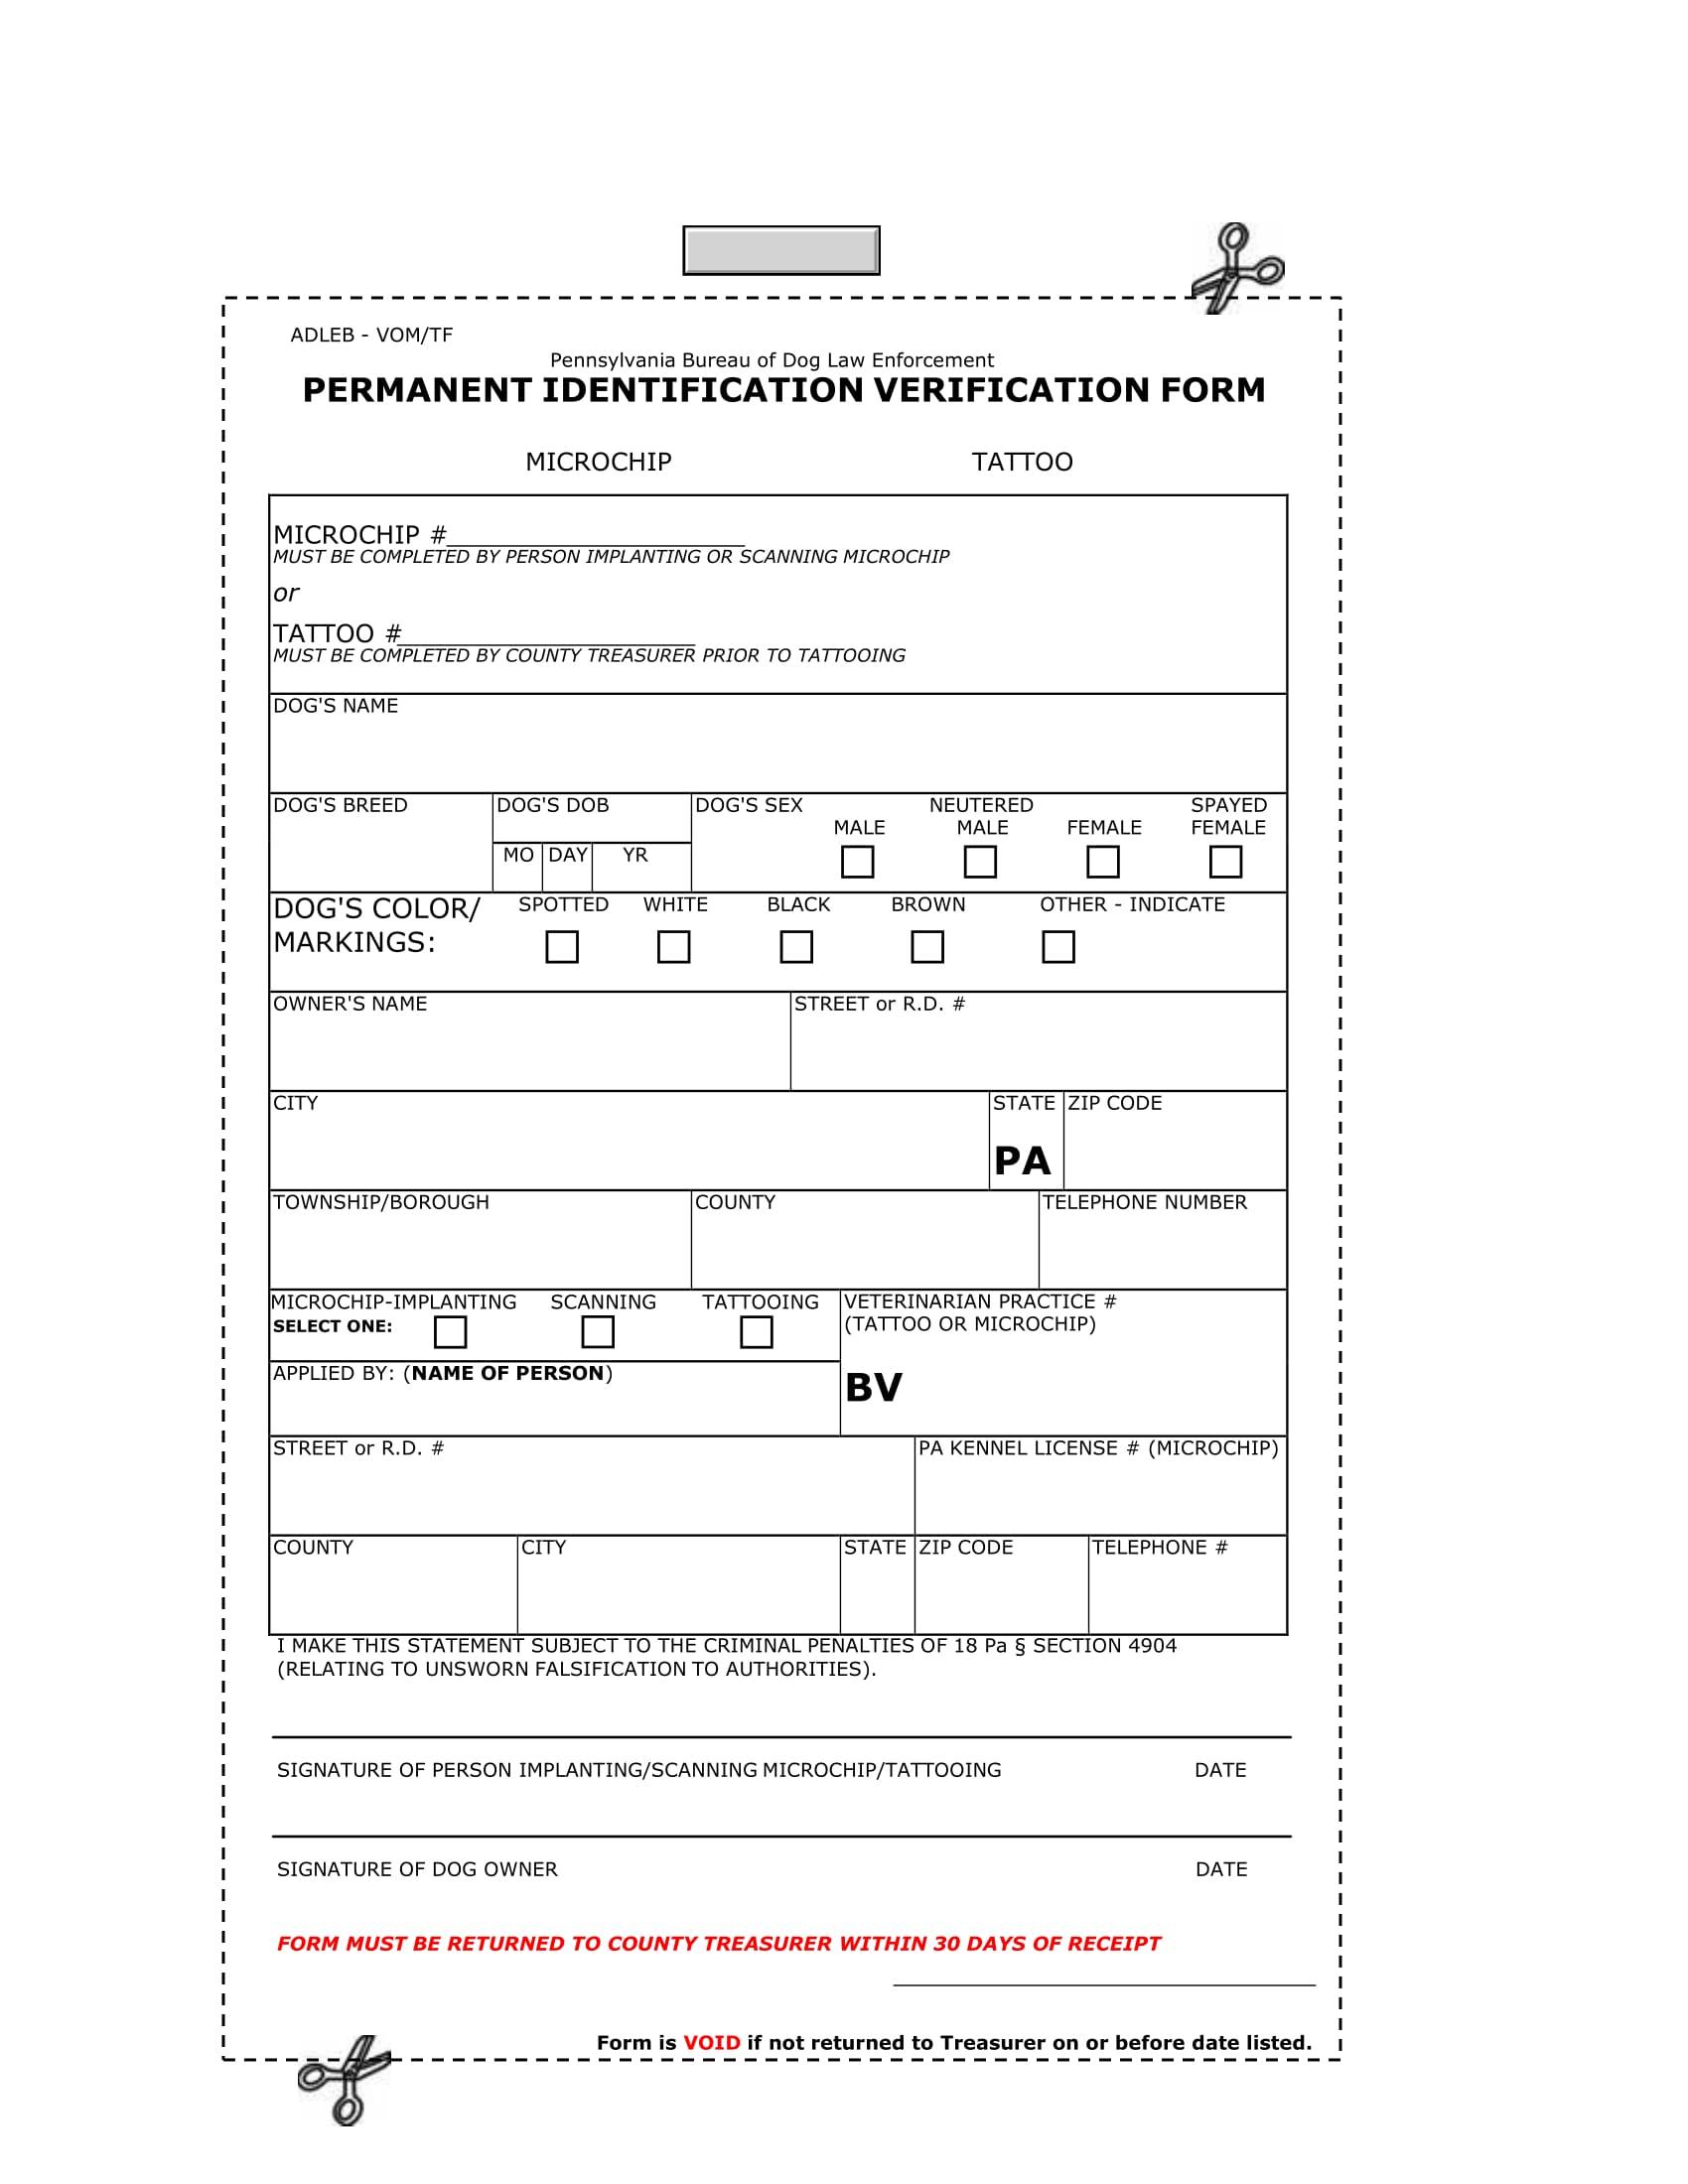 permanent identification verification form 1